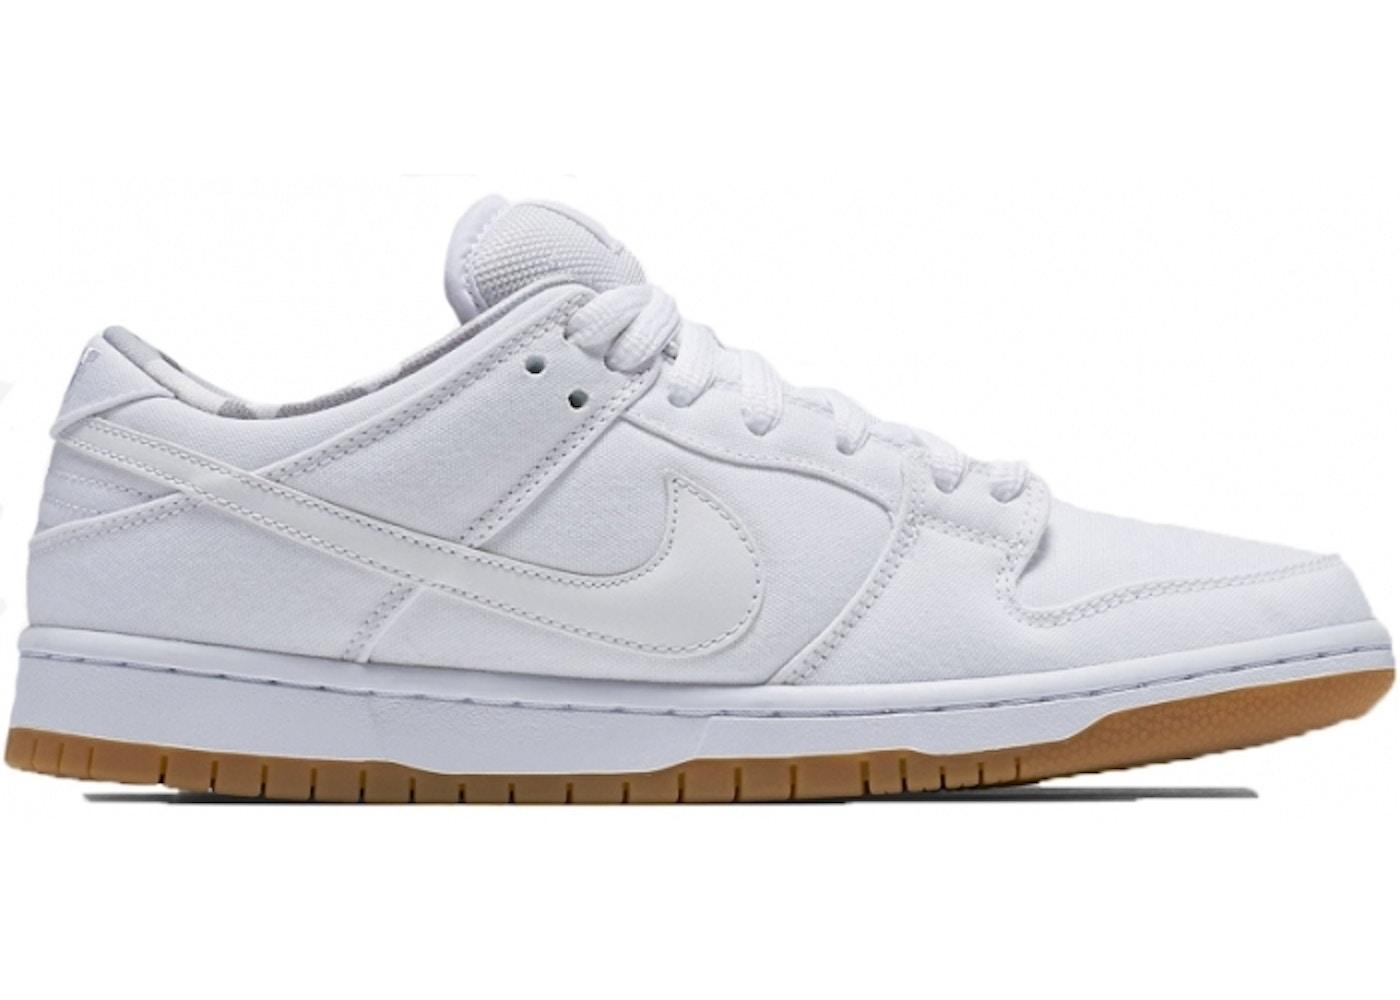 sale retailer 8e266 bfd86 Nike Dunk SB Low Tokyo 2015